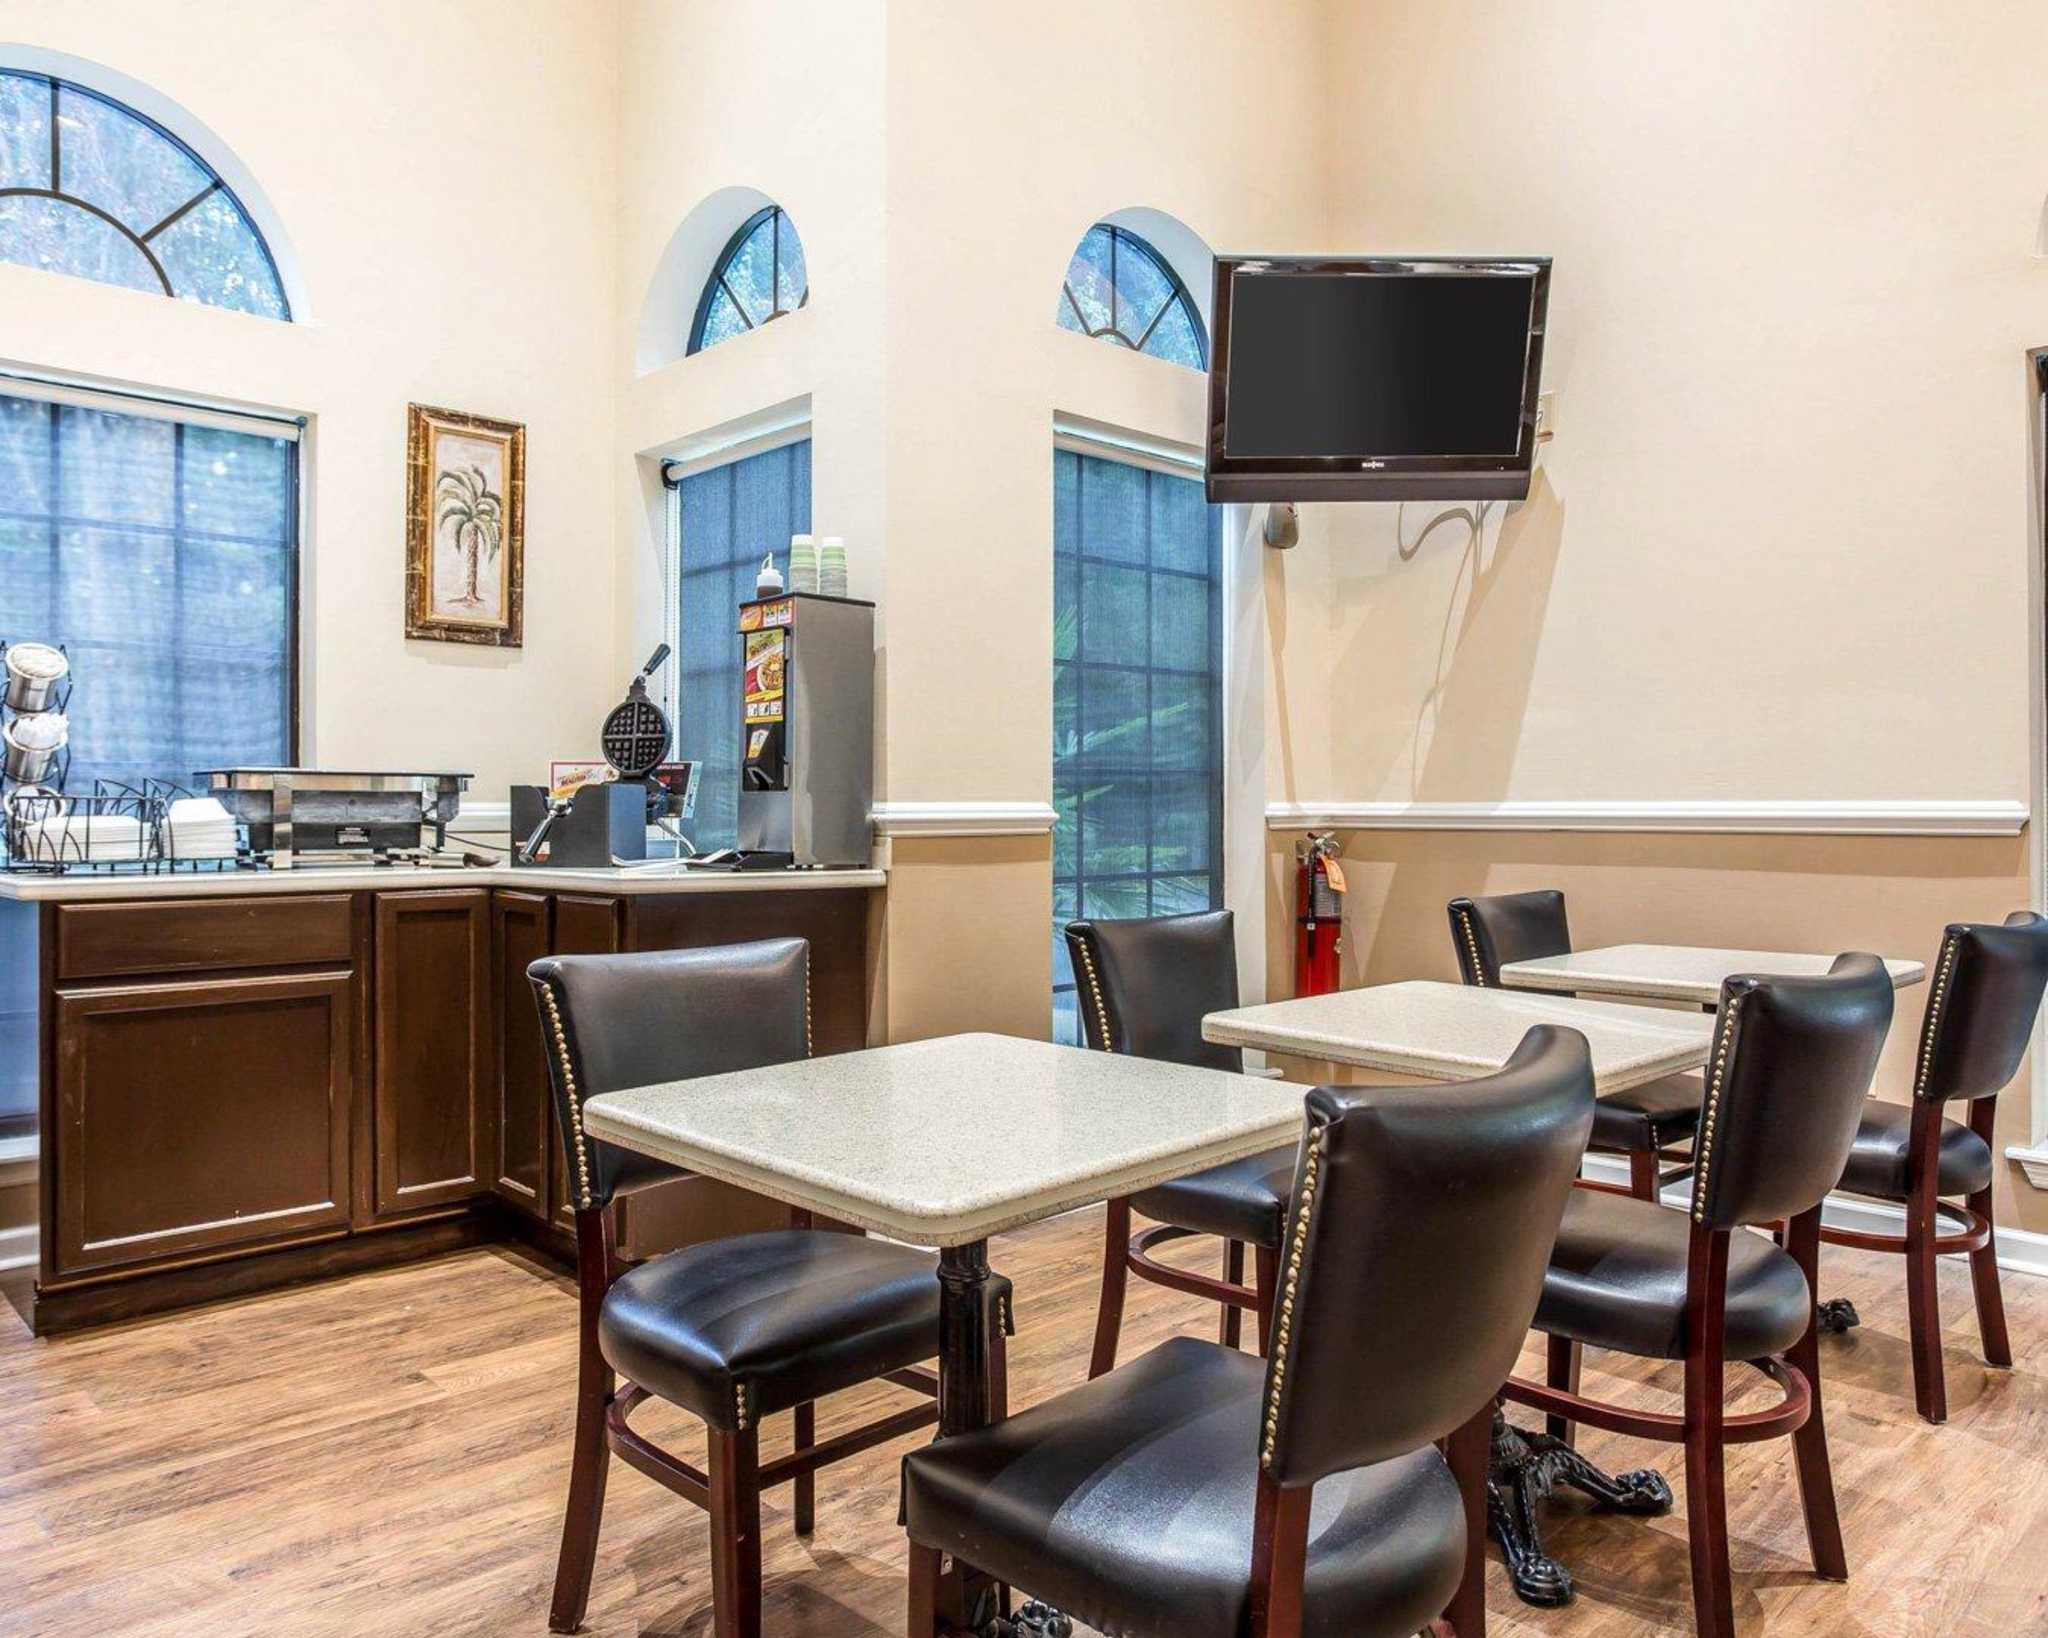 Econo Lodge Inn & Suites image 19